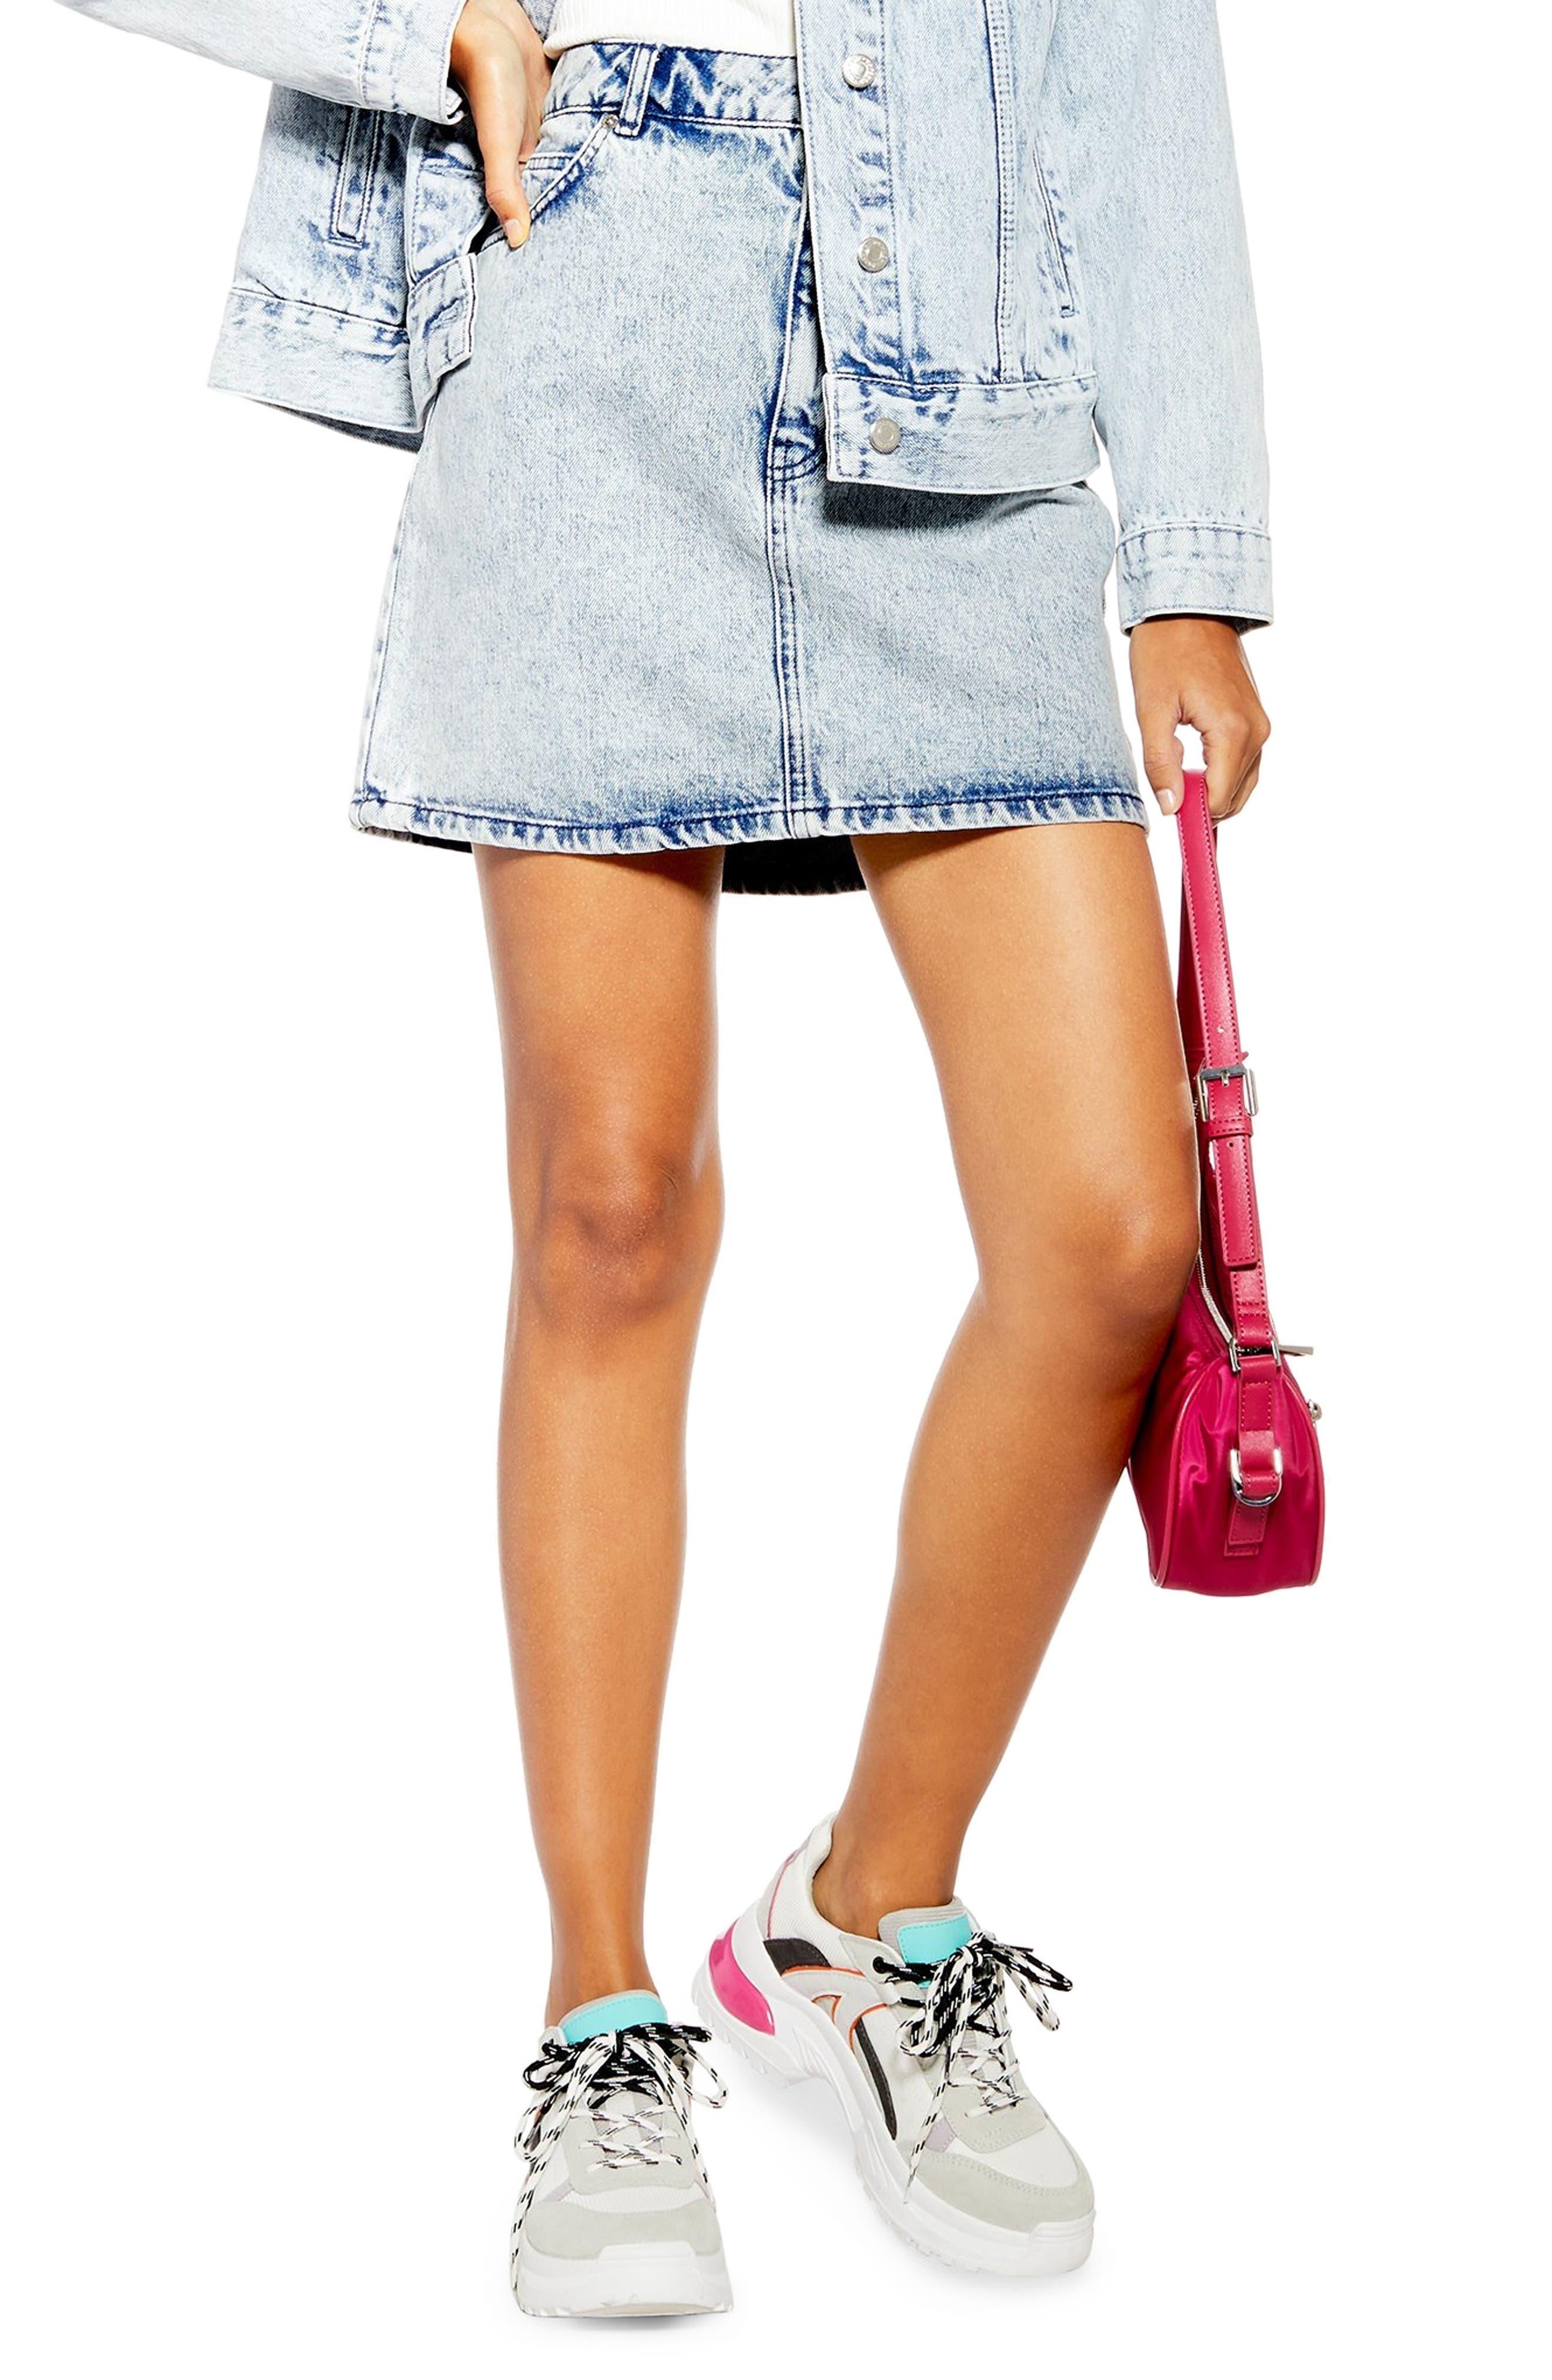 Topshop Acid Wash Denim Miniskirt, US (fits like 2-4) - Blue